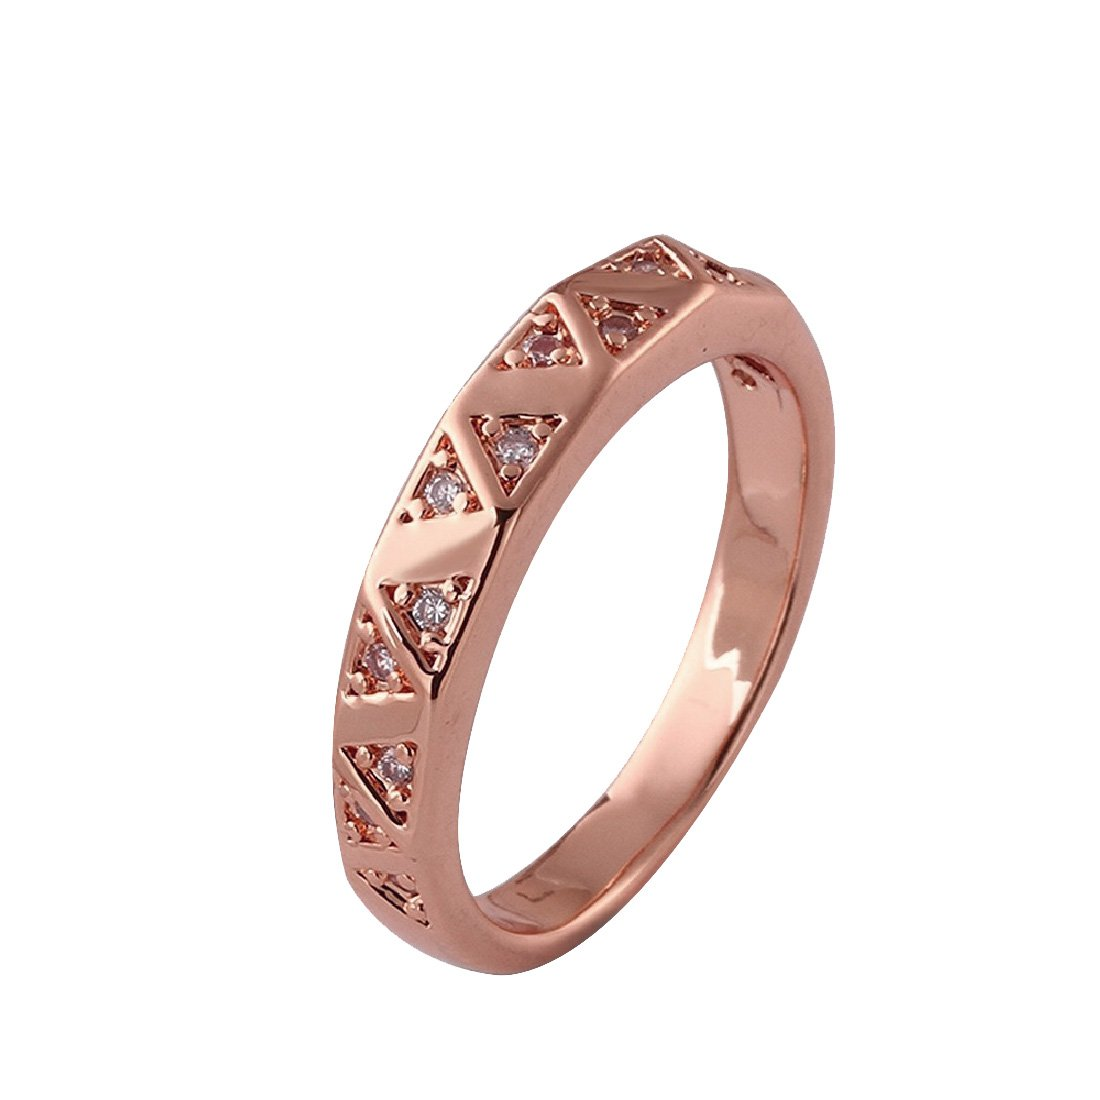 Rose Gold Copper: Amazon.com: Smooth Copper & Brass Twist Copper Bracelet